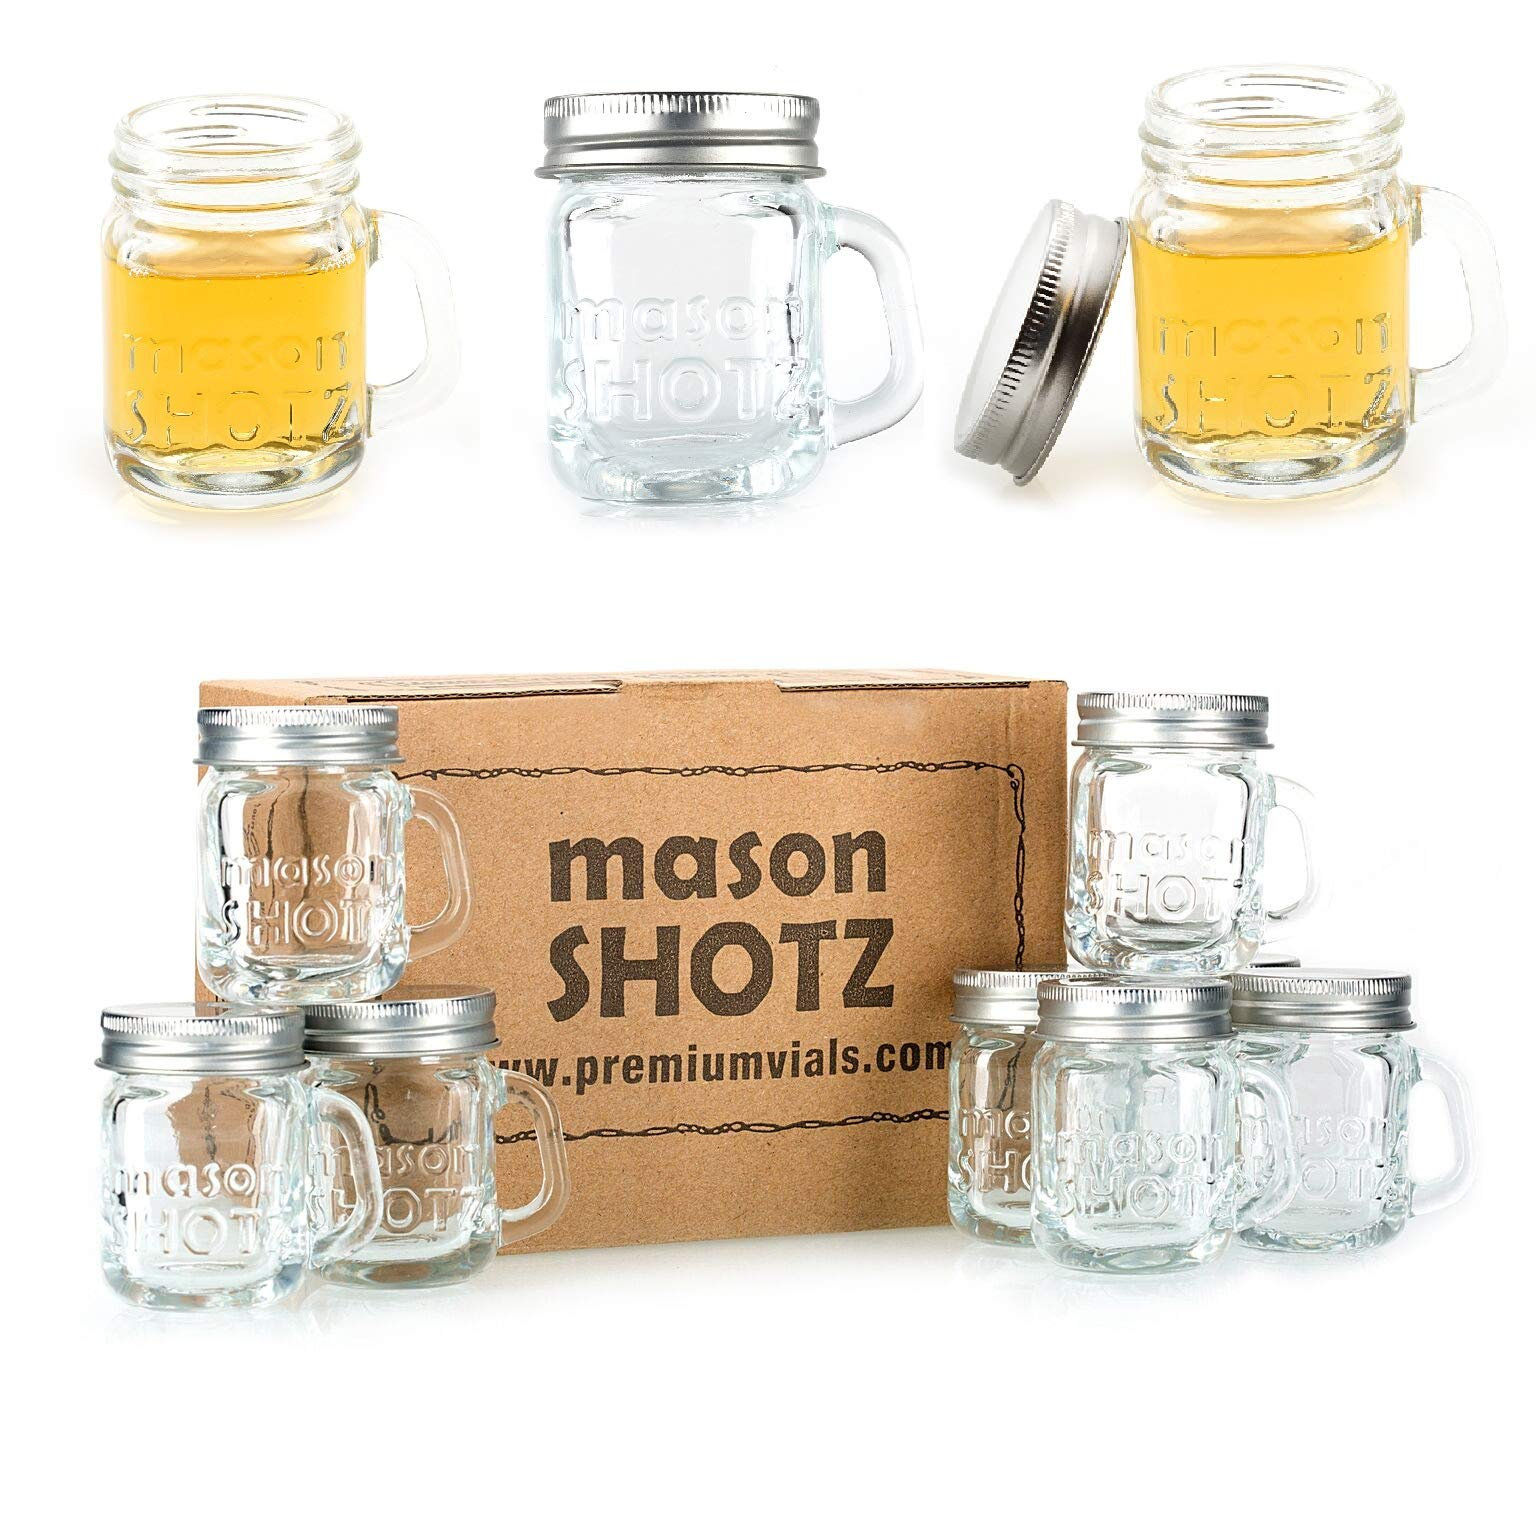 Premium Vials Mini Mason Jar Shot Glasses With Handles Set Of 8